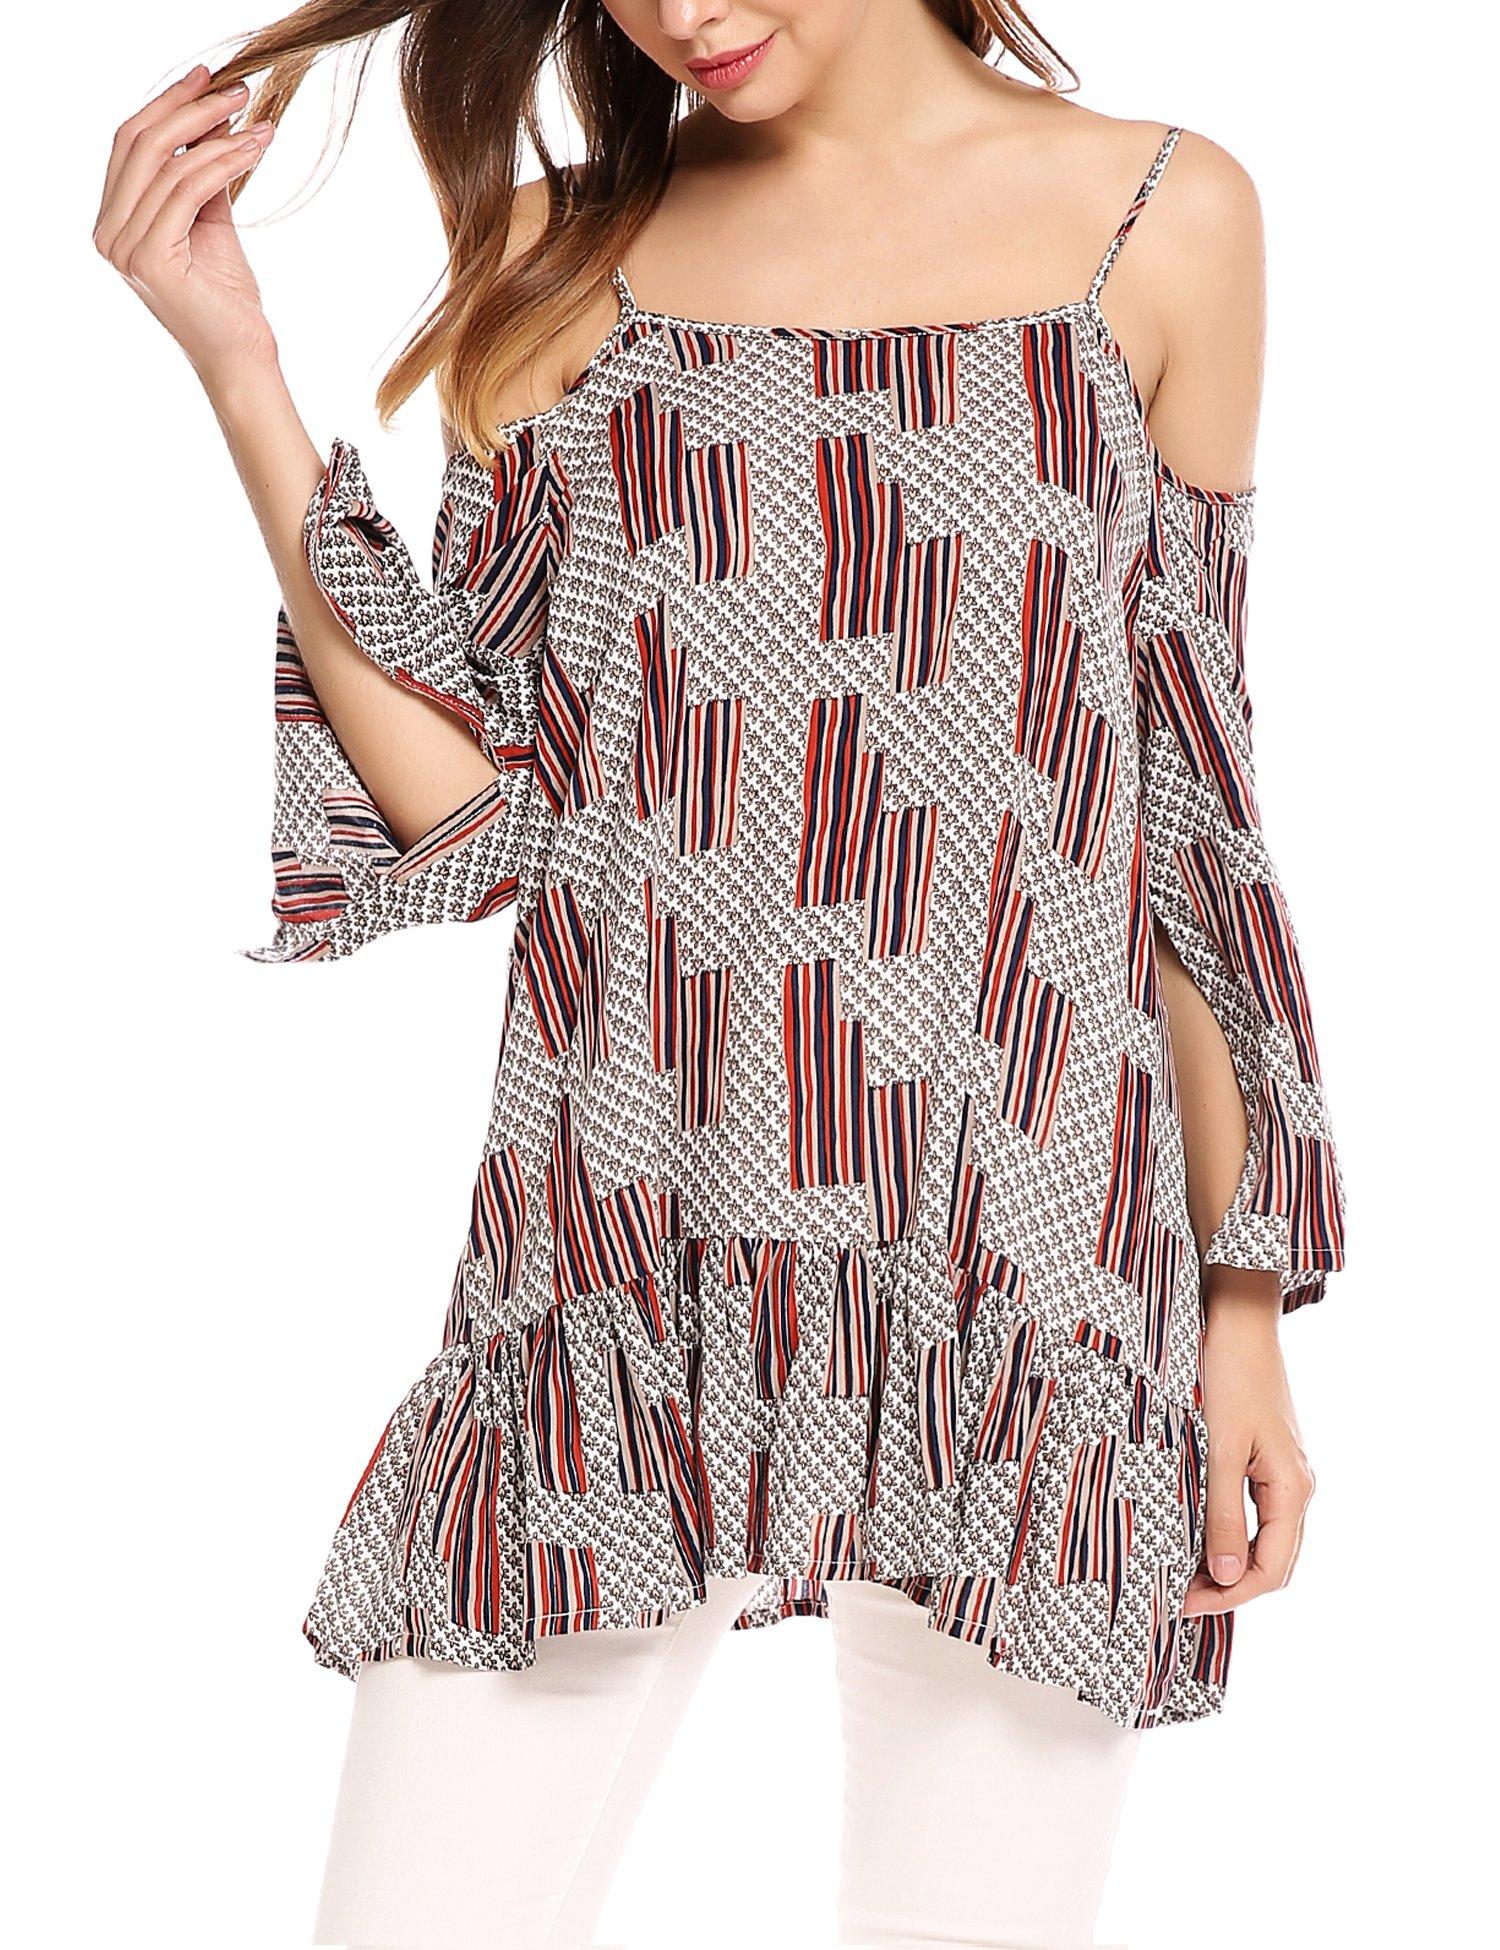 Zeagoo Women Summer Chiffon Cut Out Cold Shoulder Peplum Tops Spaghetti Strap 3/4 Slit Sleeve Ruffled Print Blouse Top